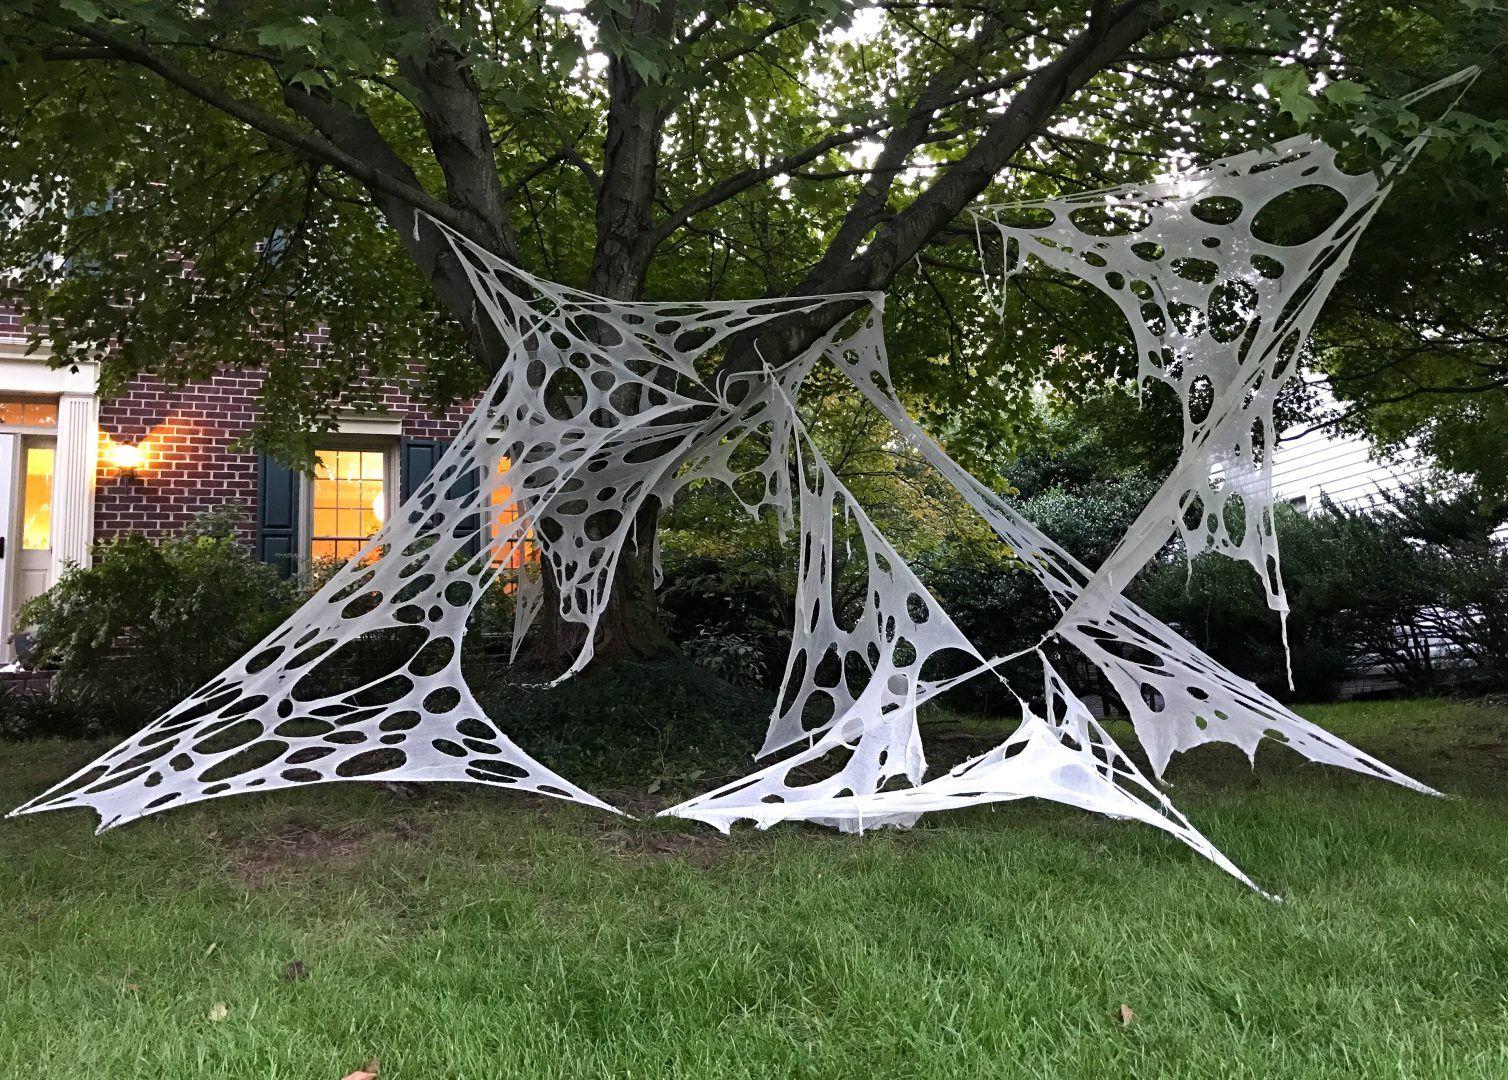 How To Make Giant Halloween Spider Webs Diy Halloween Spider